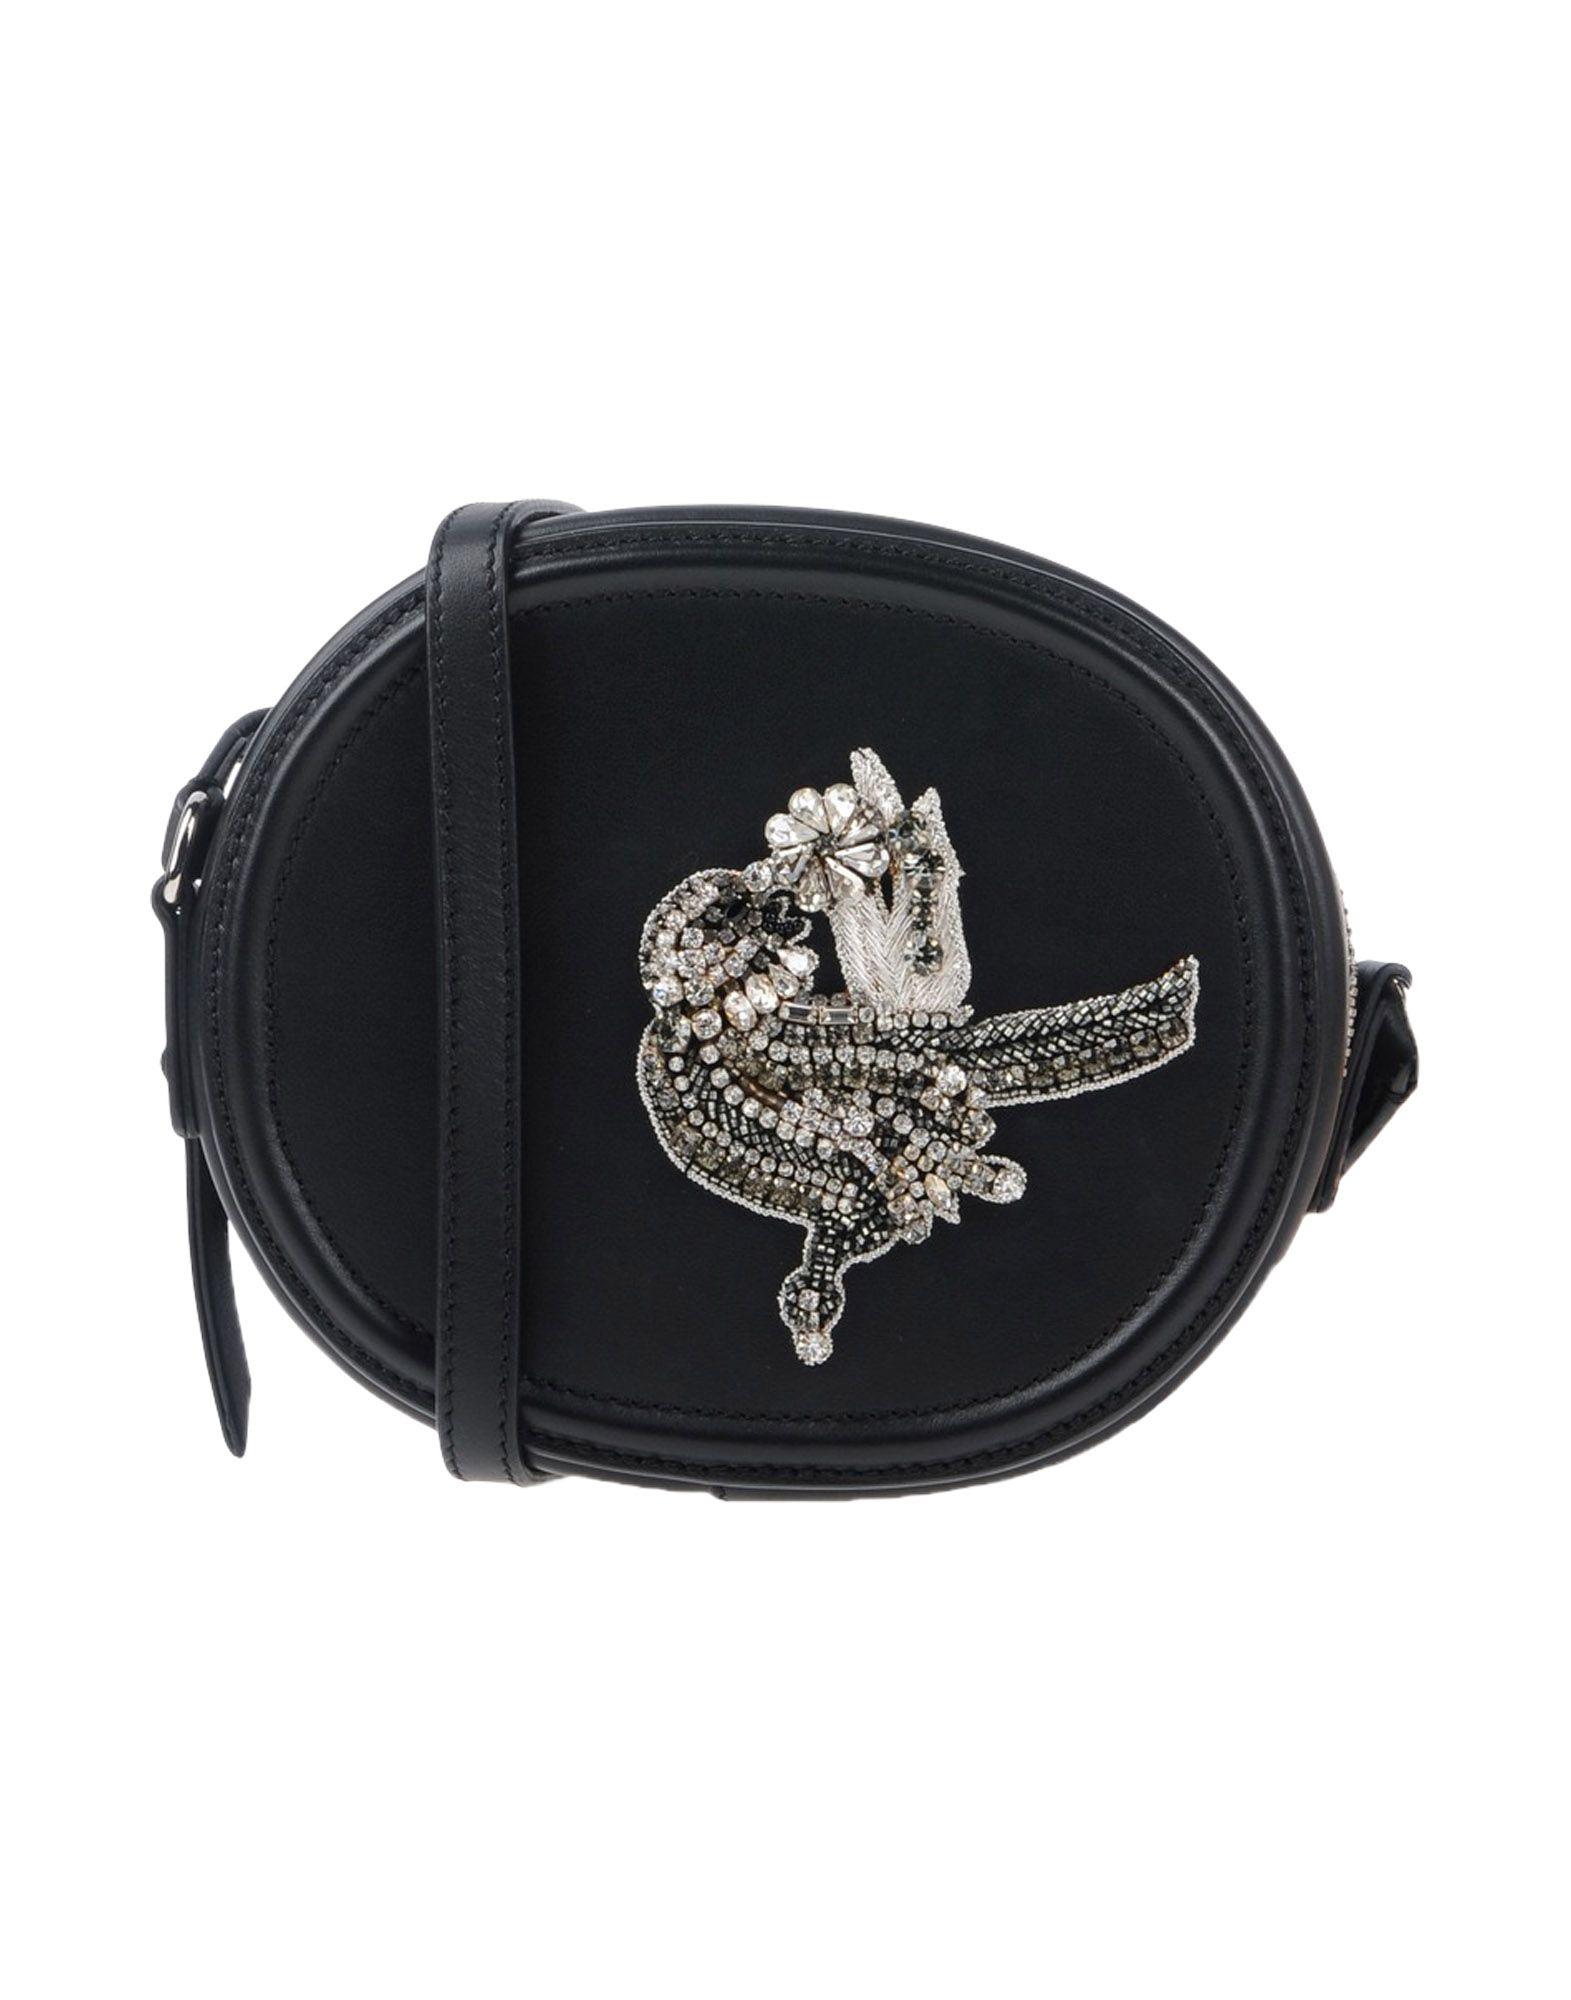 N° 21 Сумка через плечо ograff handbag men bag genuine leather briefcases shoulder bags laptop tote men crossbody messenger bags handbags designer bag